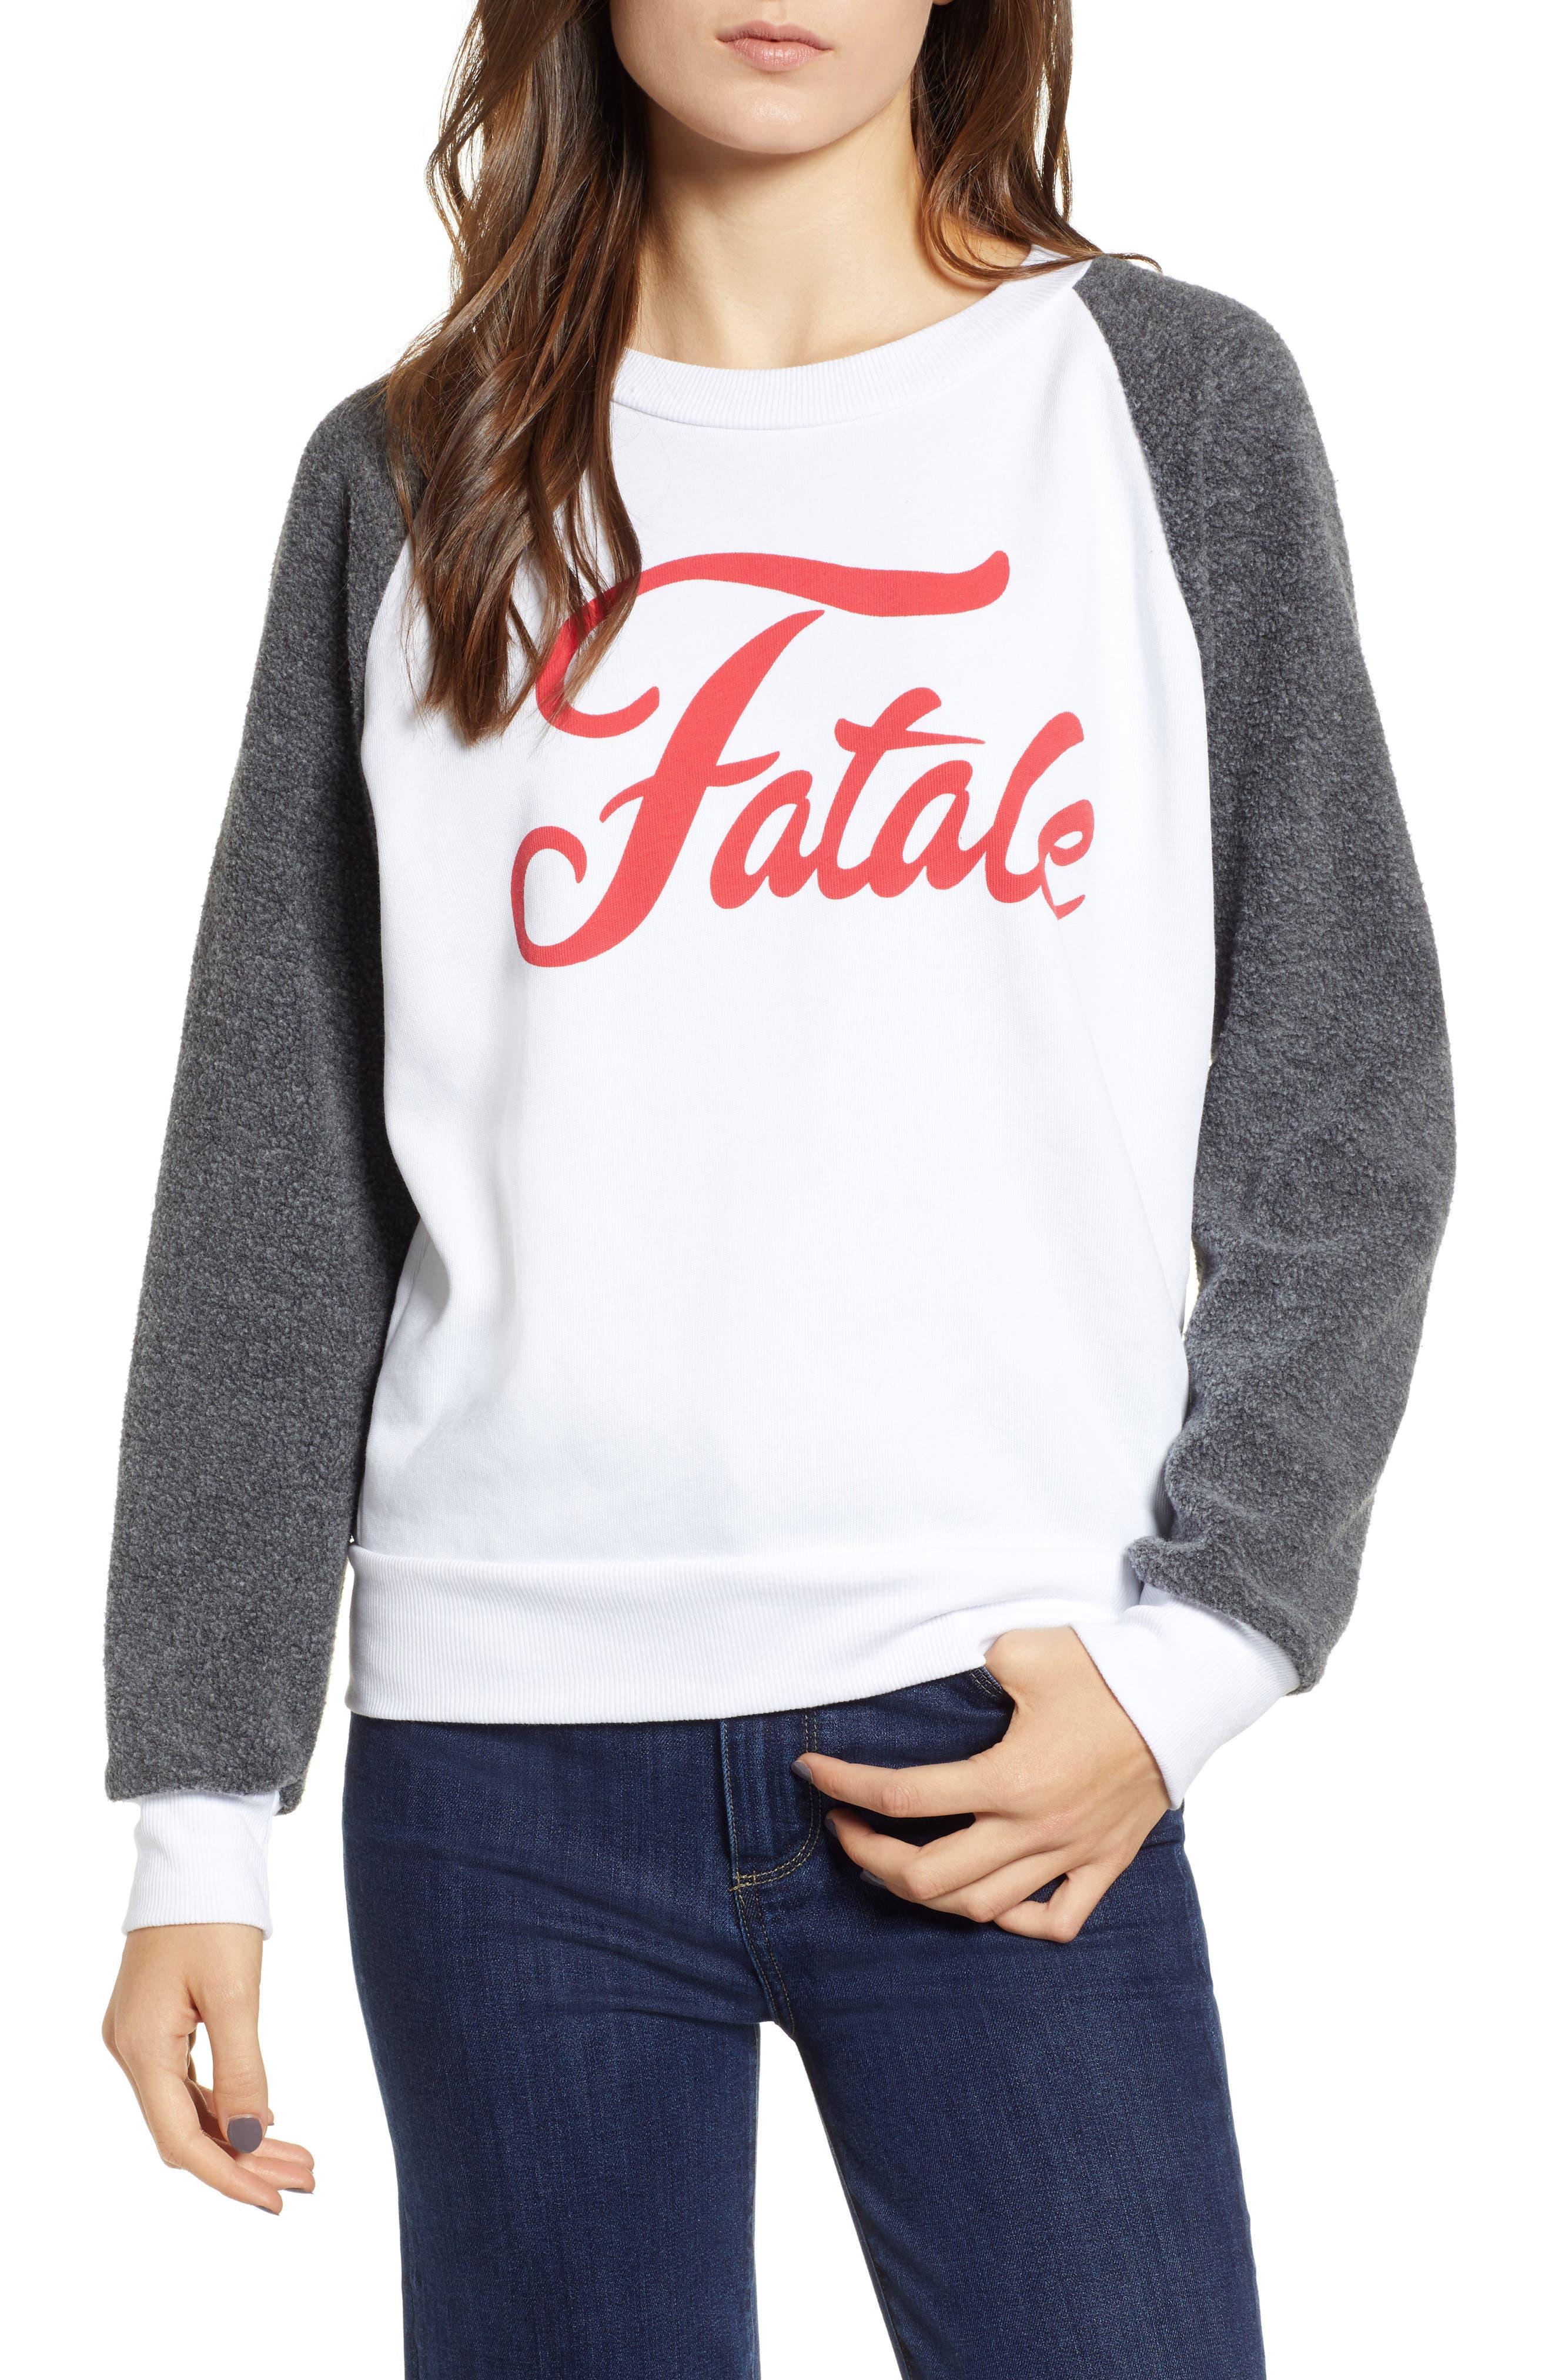 Fatale Fleece Sleeve Sweatshirt,                         Main,                         color, CLEAN WHITE/ CLEAN BLACK